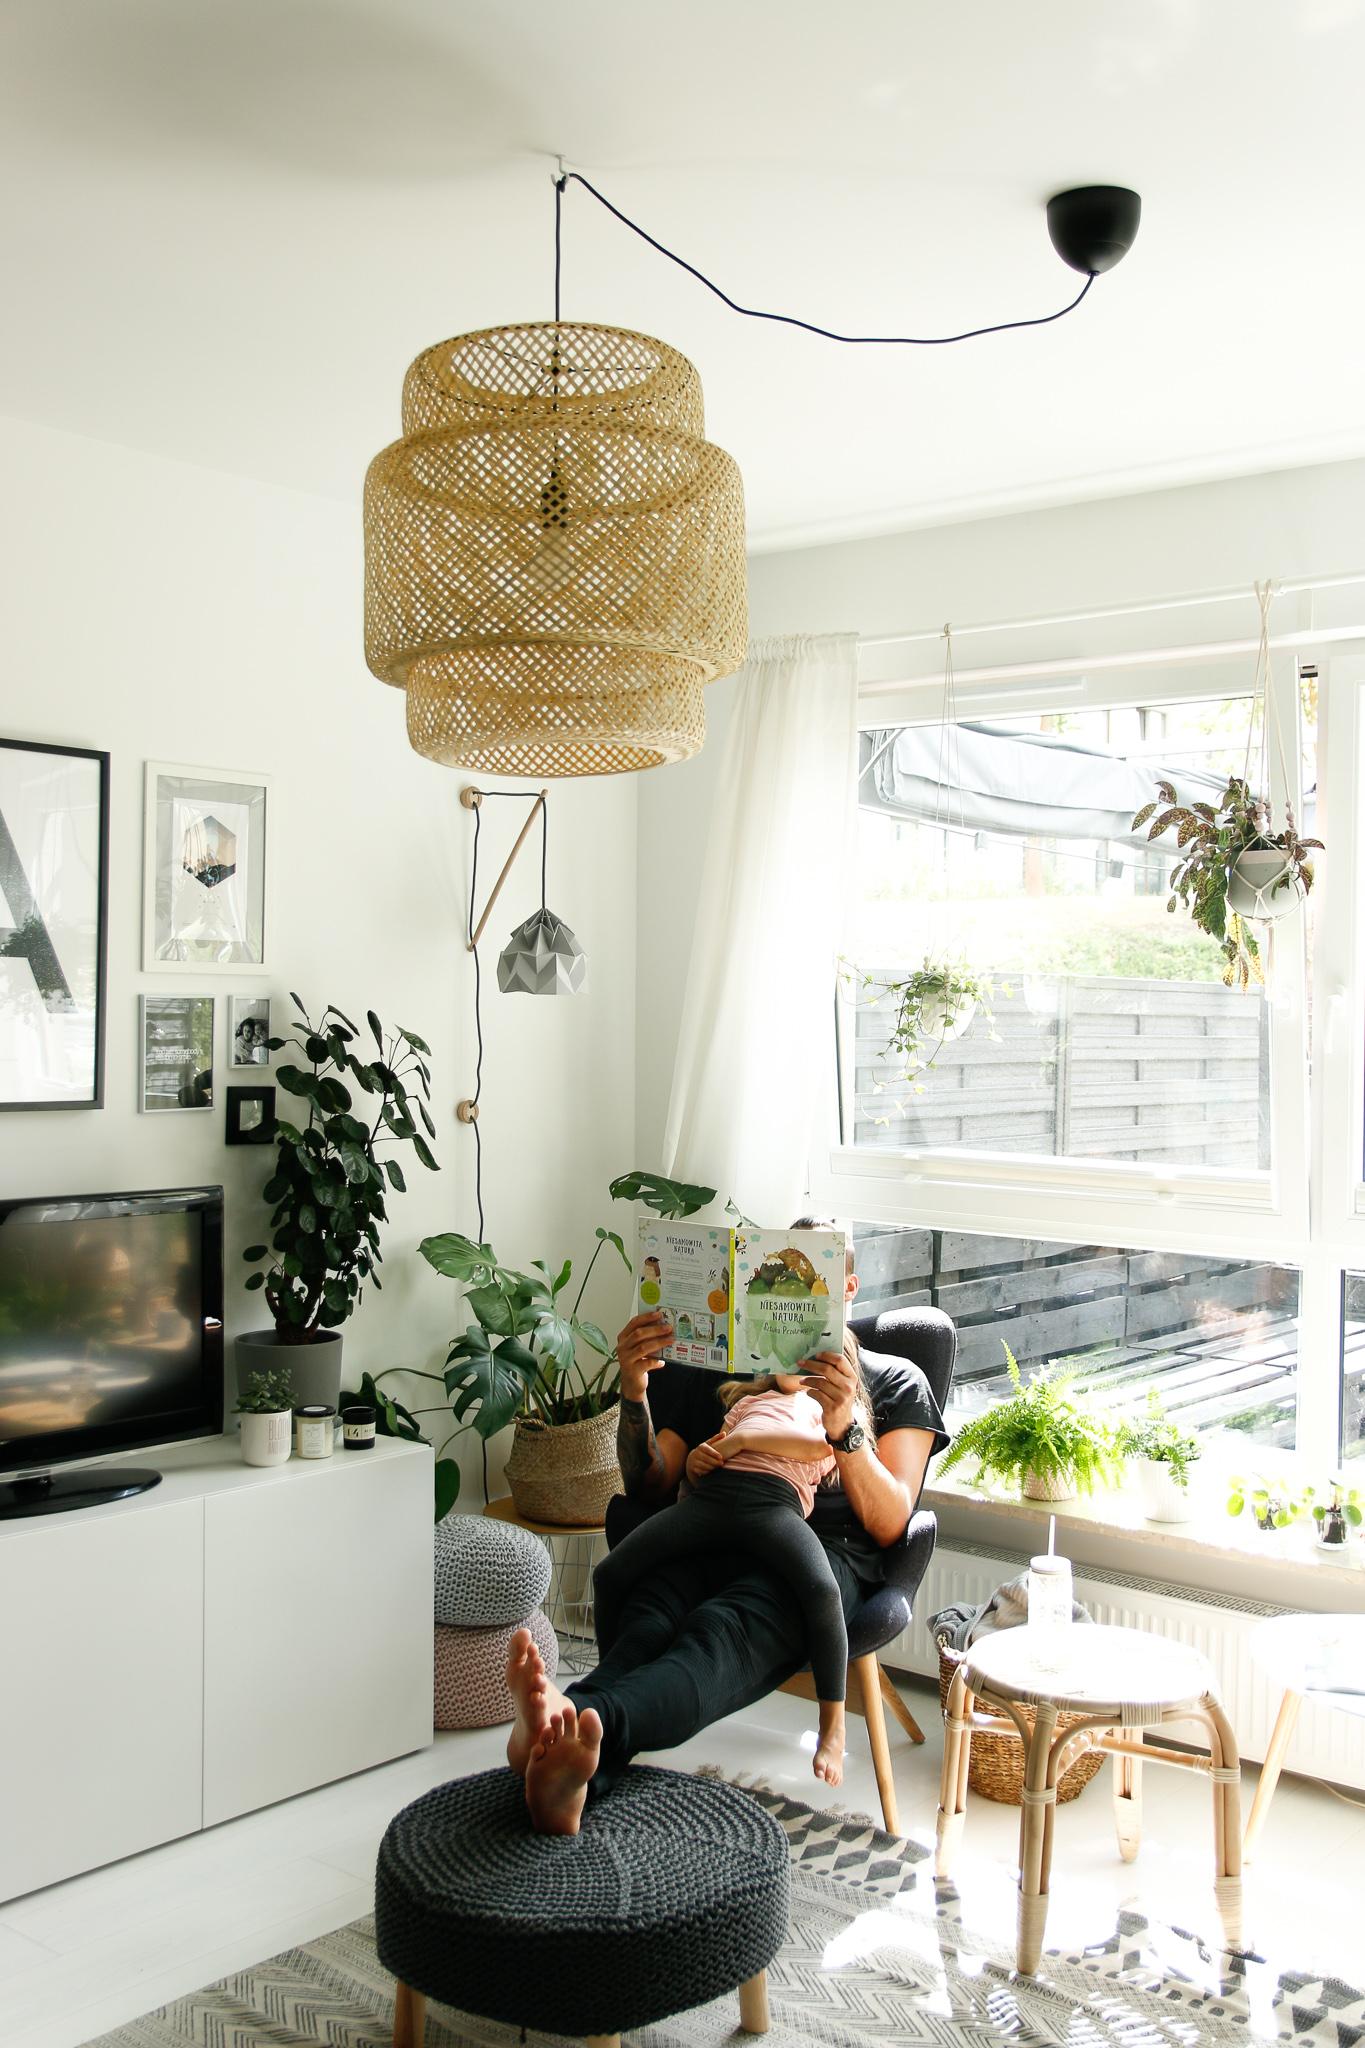 duża lampa sufitowa